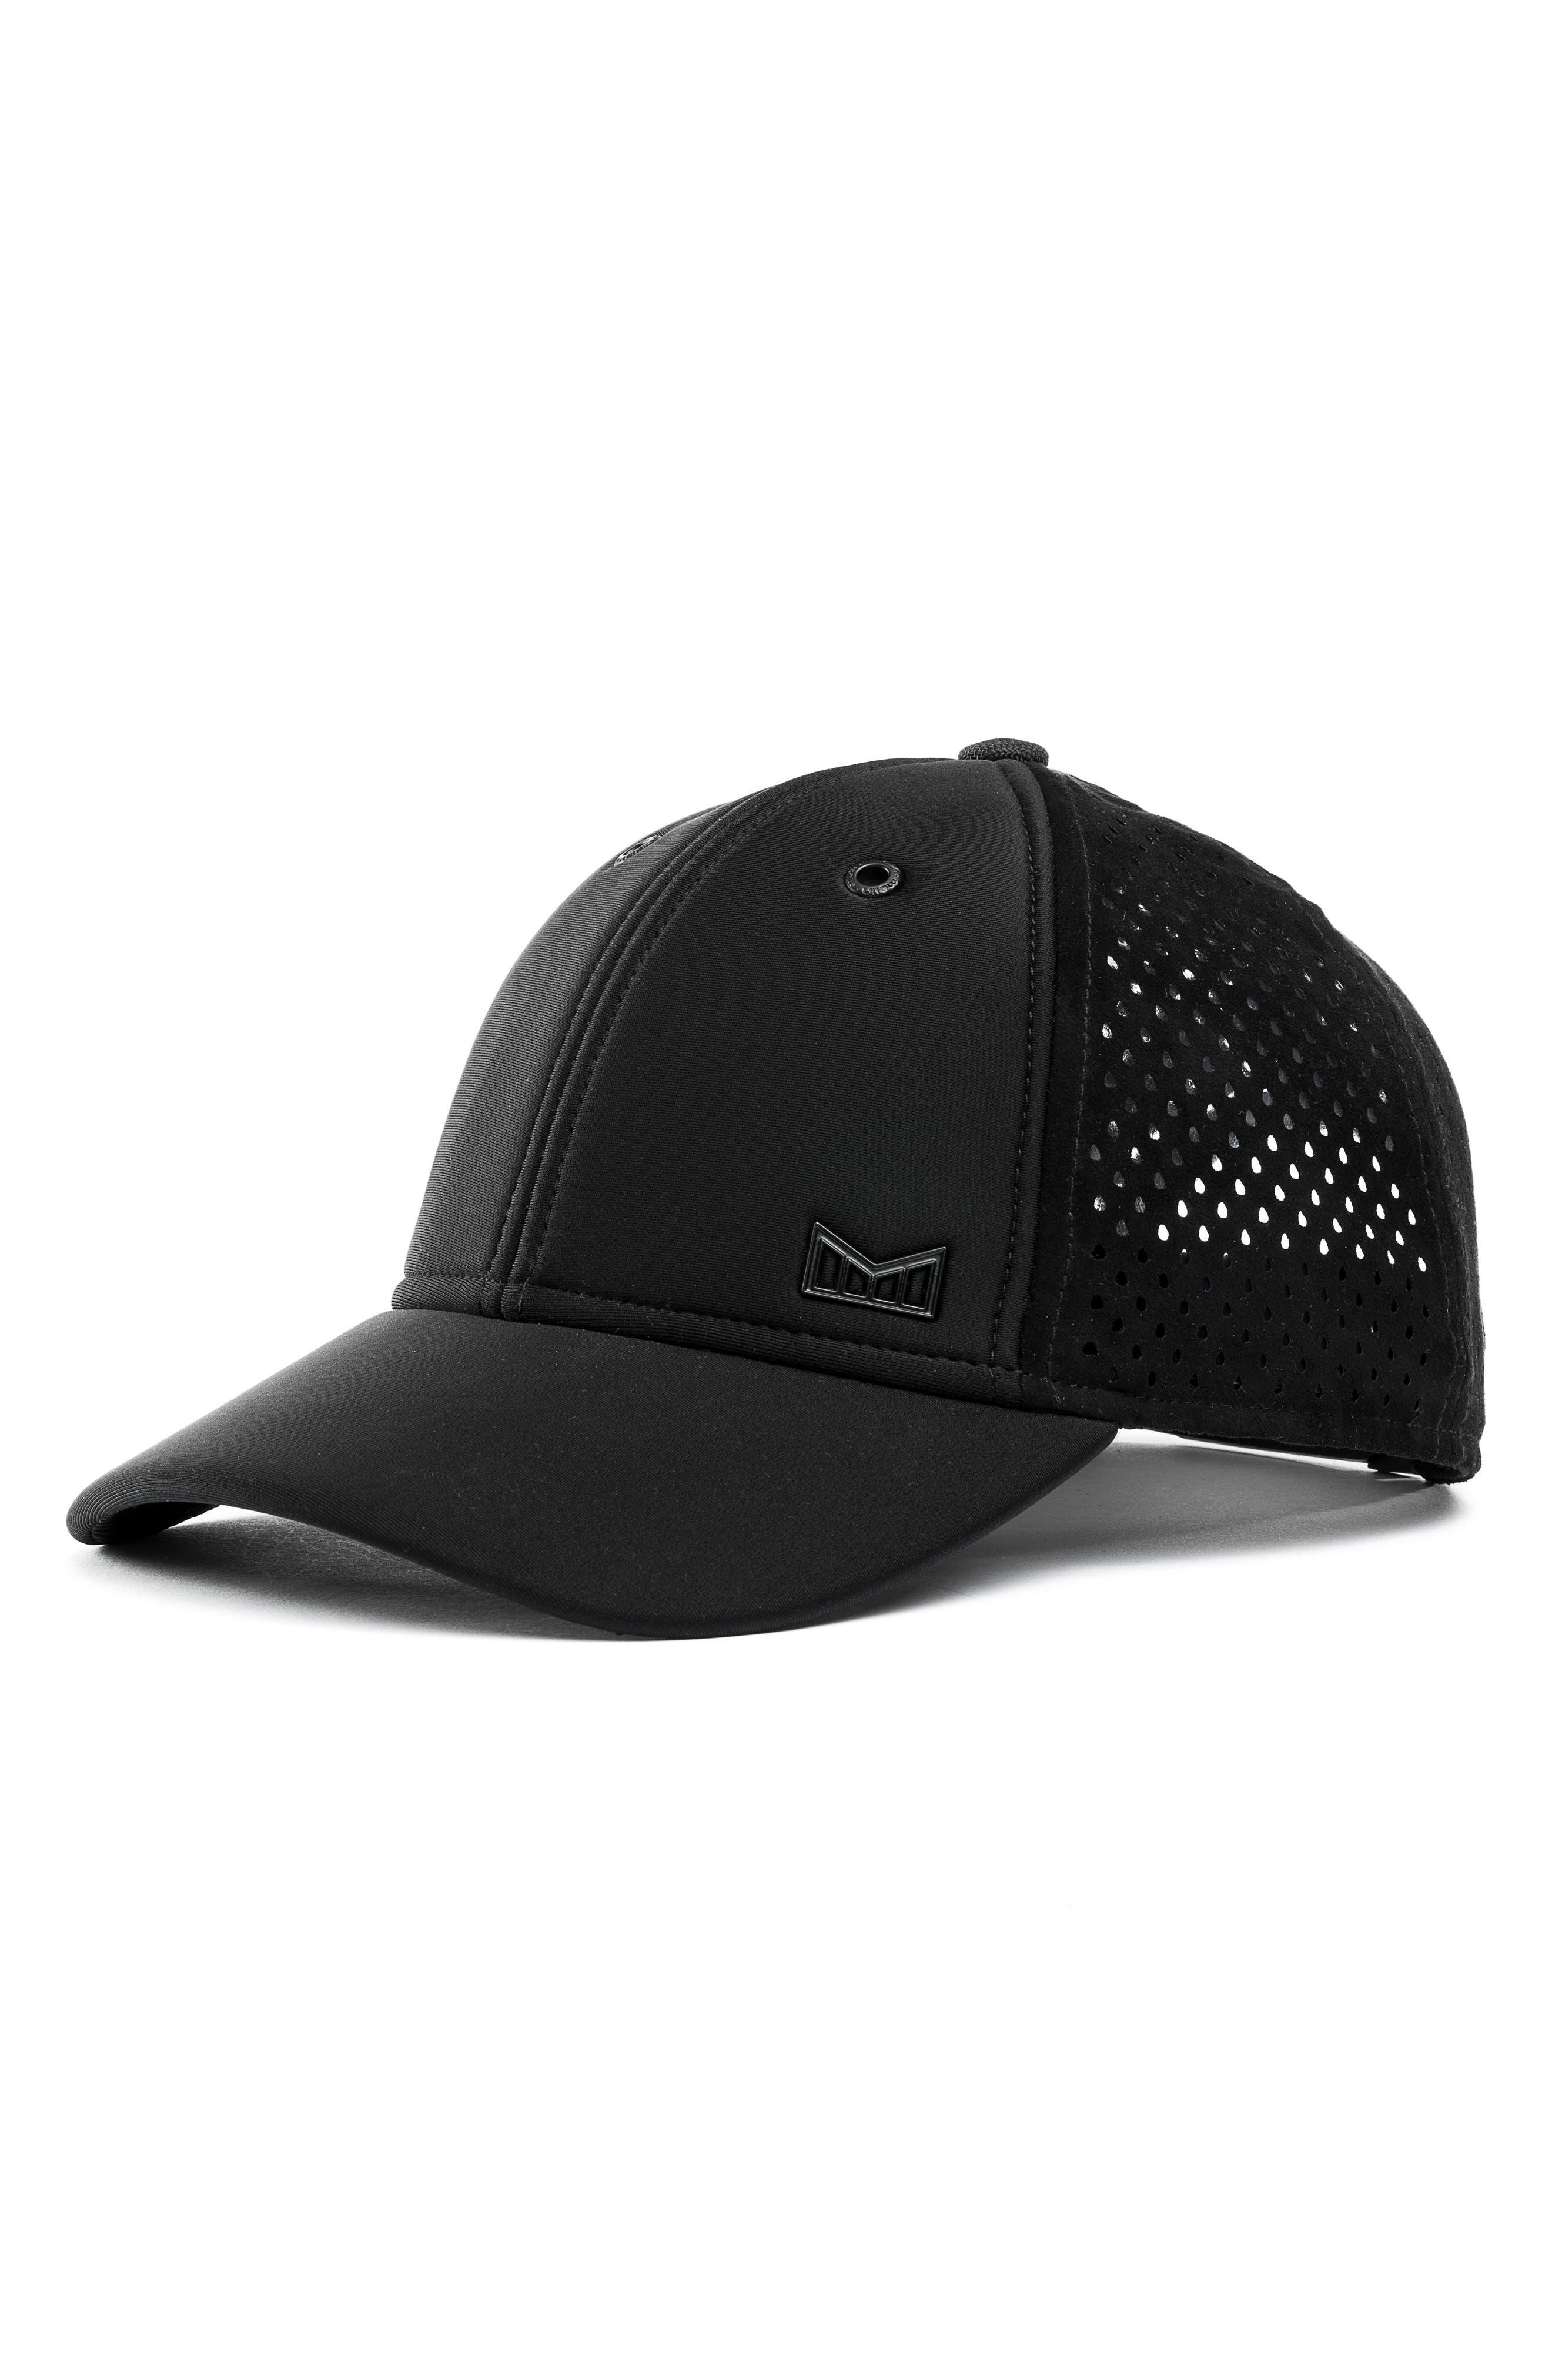 MELIN Trooper II Snapback Baseball Cap, Main, color, BLACK